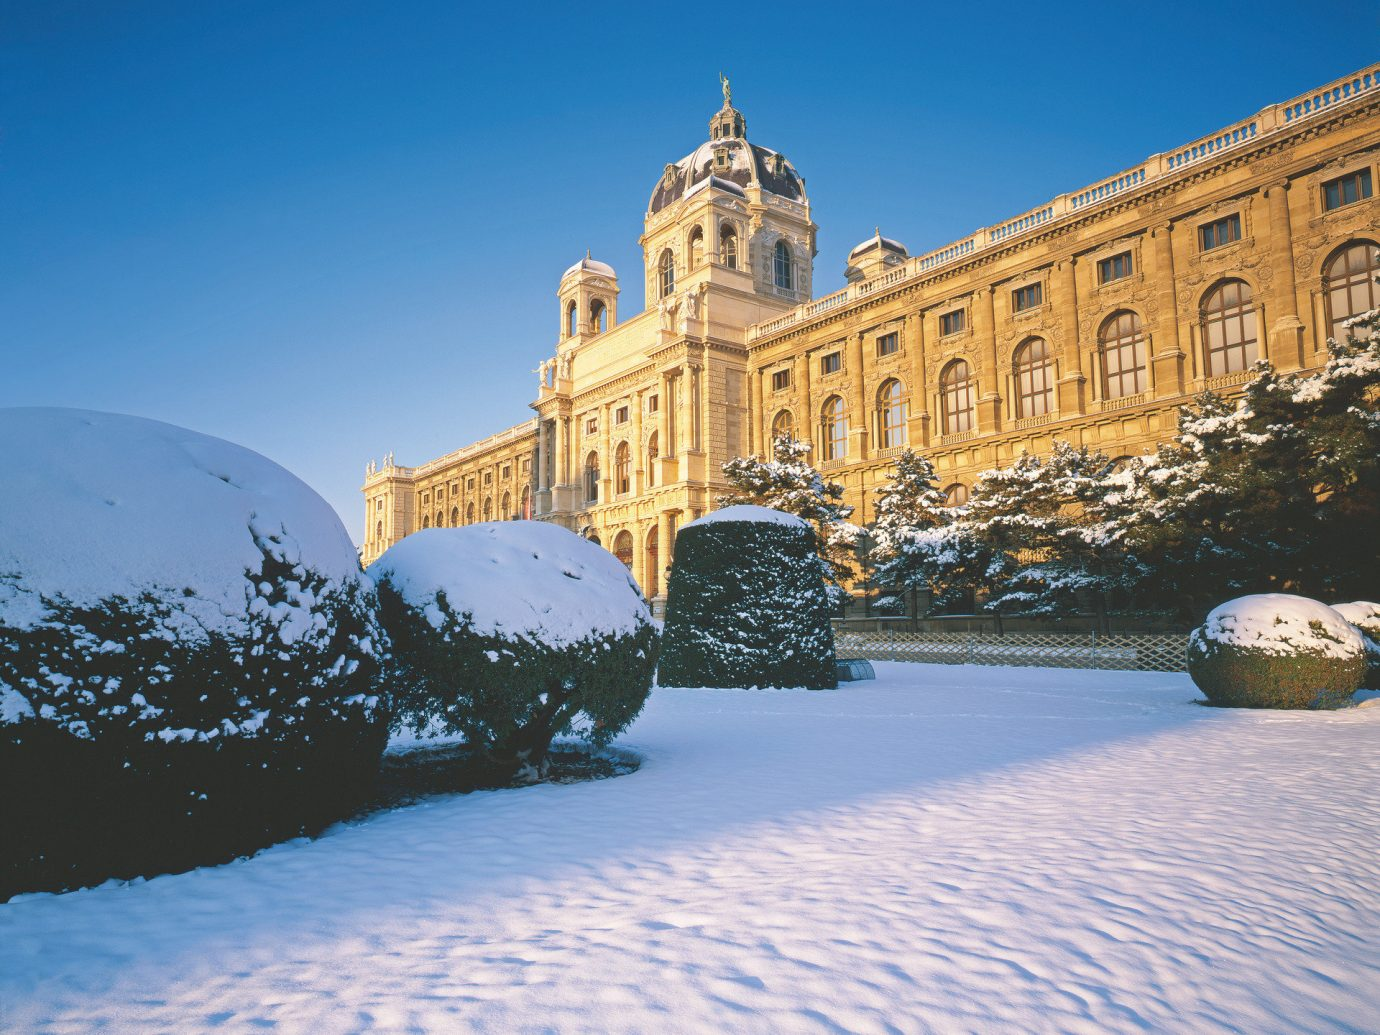 Boutique Hotels europe Romance Trip Ideas outdoor sky snow Winter weather landmark season day